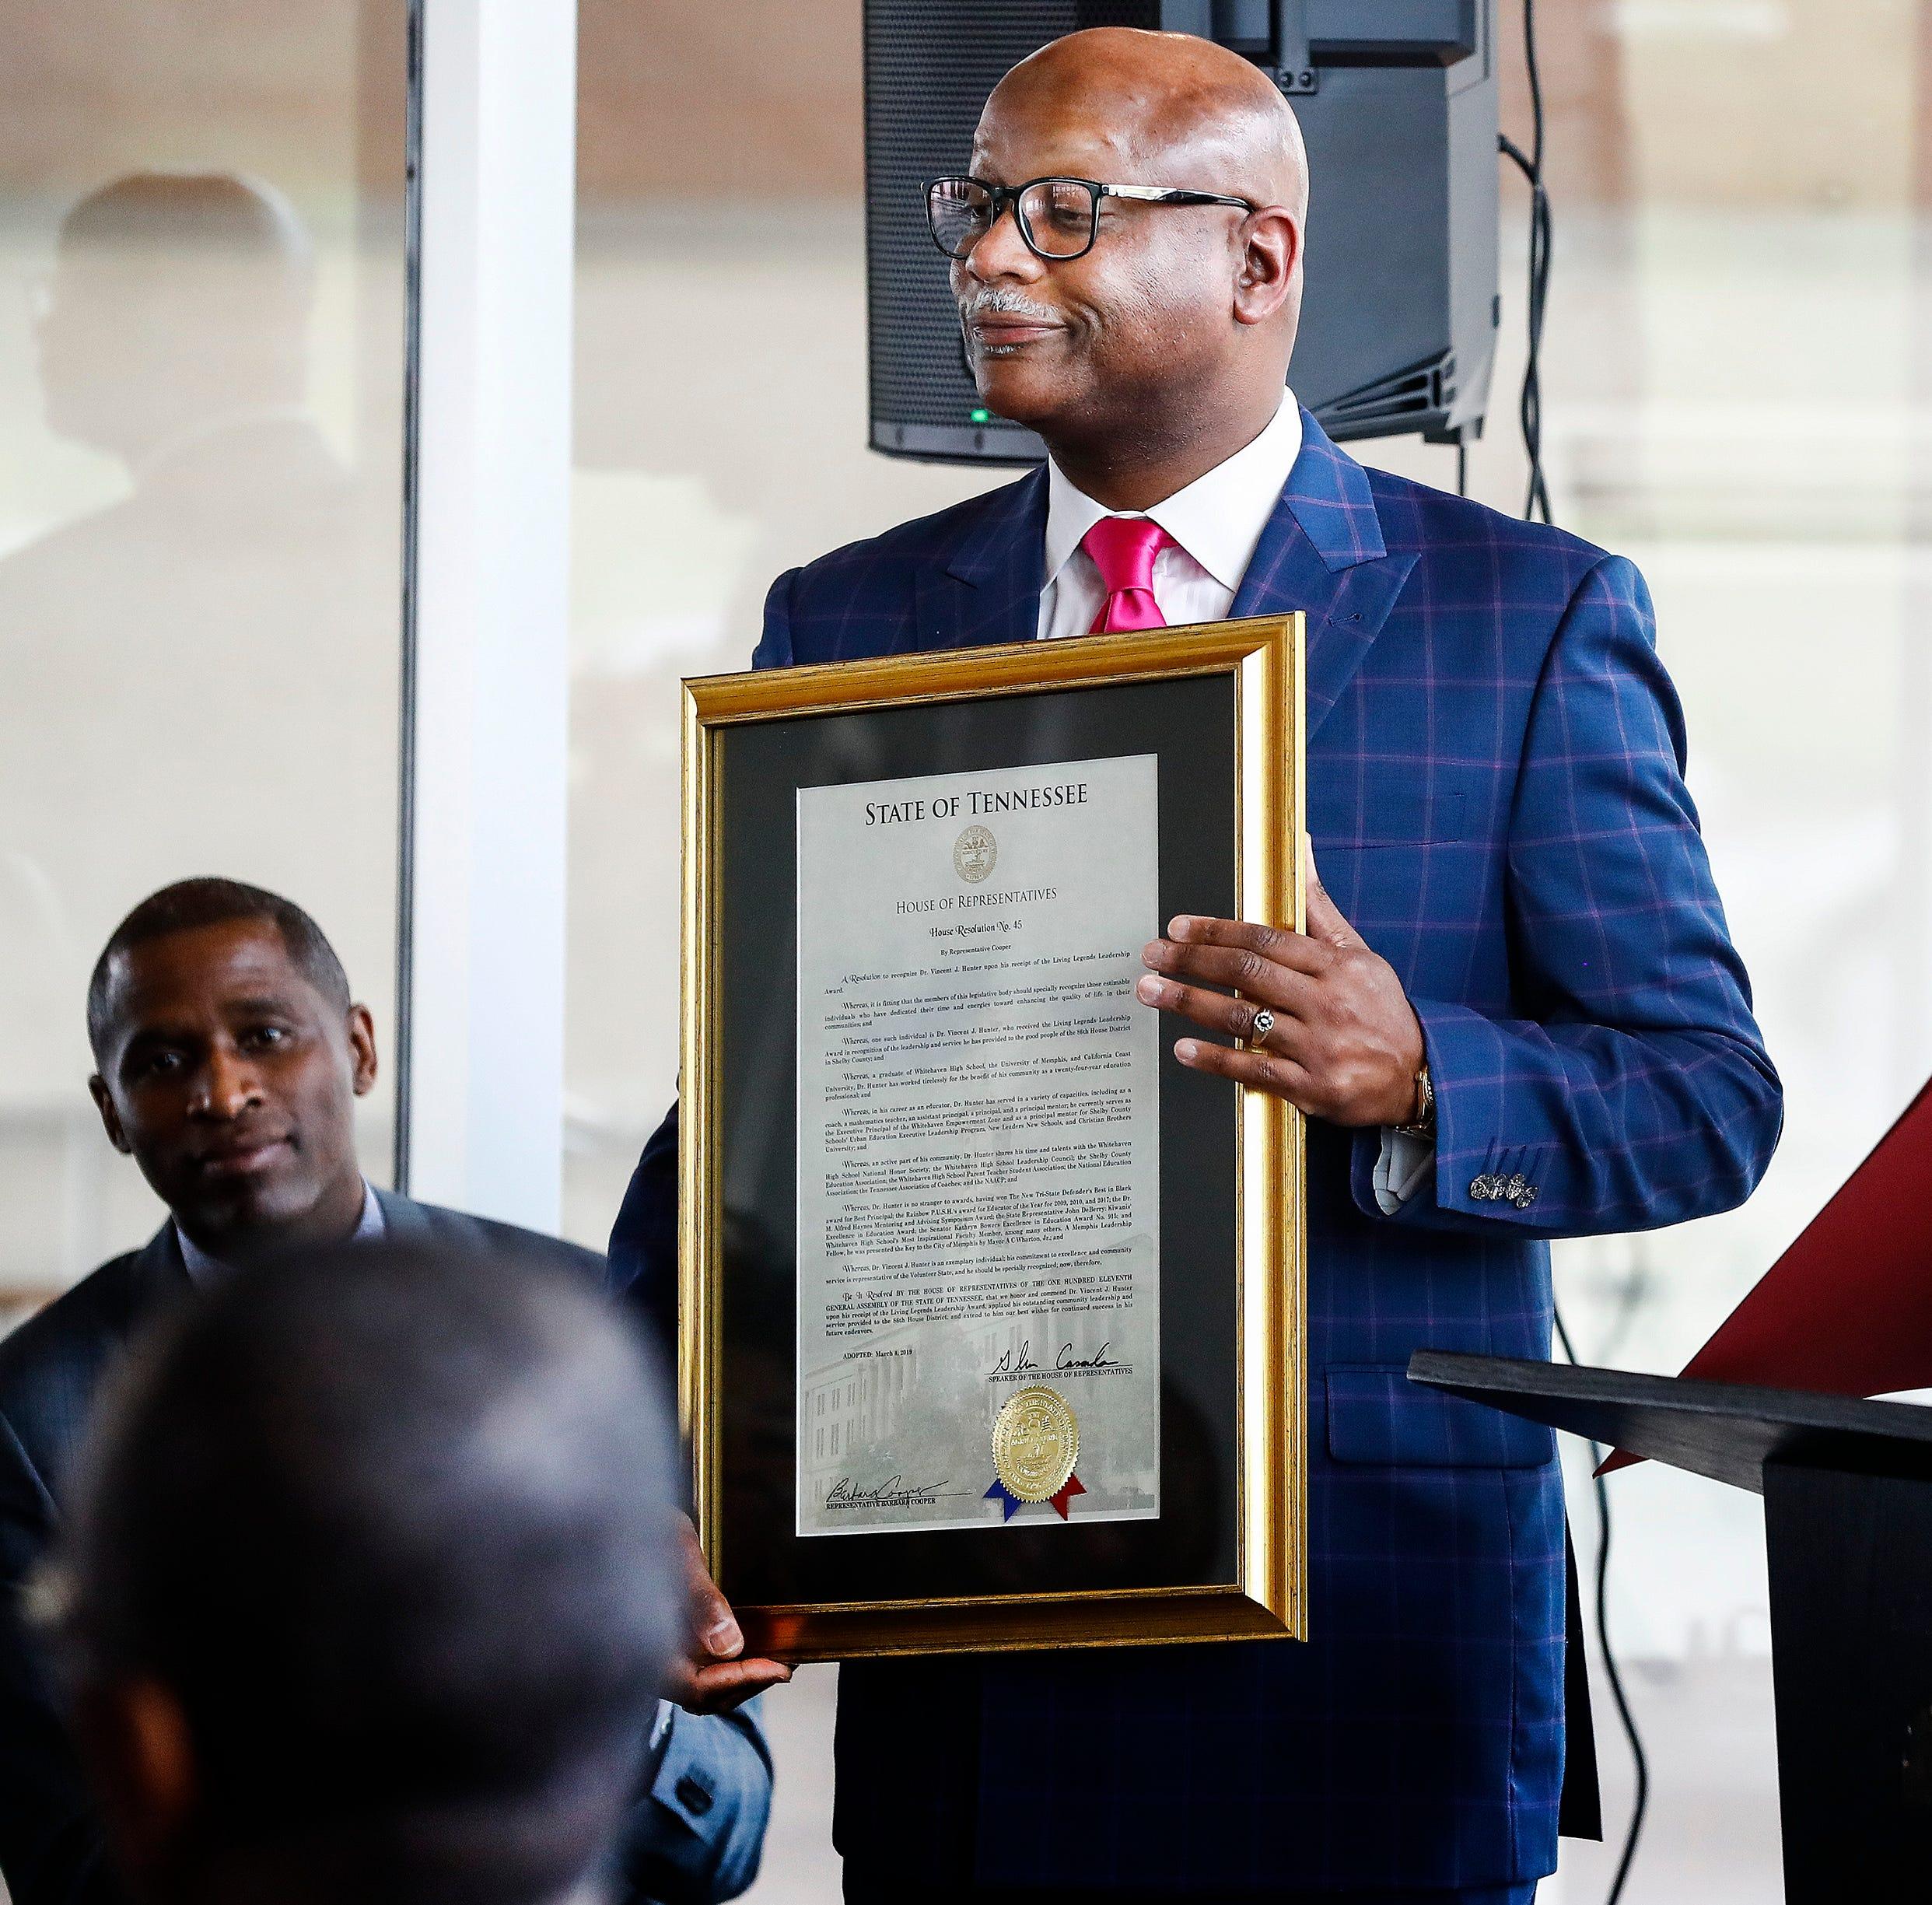 Memphians lauded as 'go-to' living legends at Harriet Tubman awards